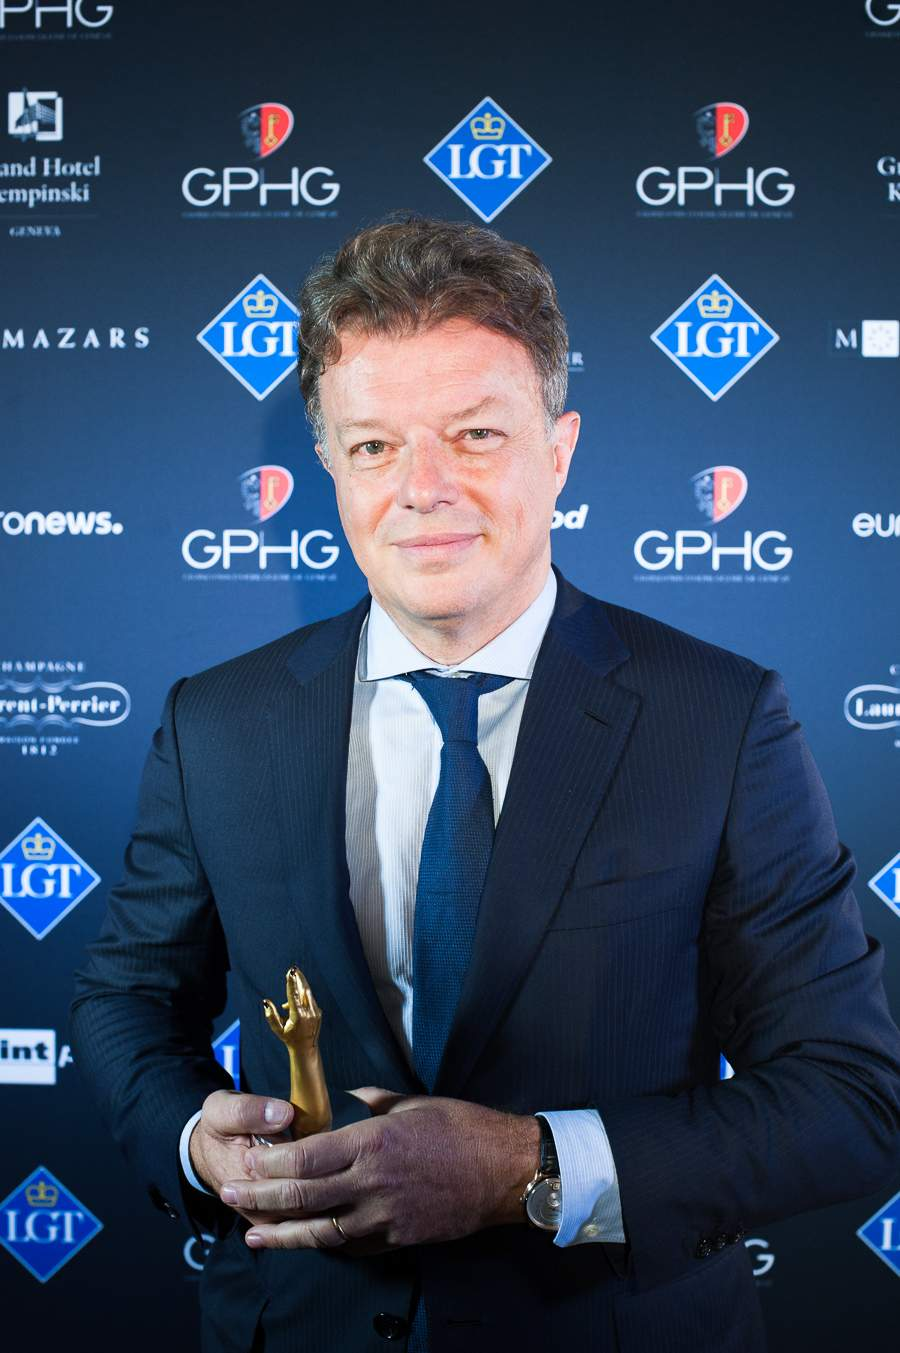 Nicolas Beau, Directeur International Horlogerie et Joaillerie of Chanel, winner of the Ladies' Watch Prize 2018